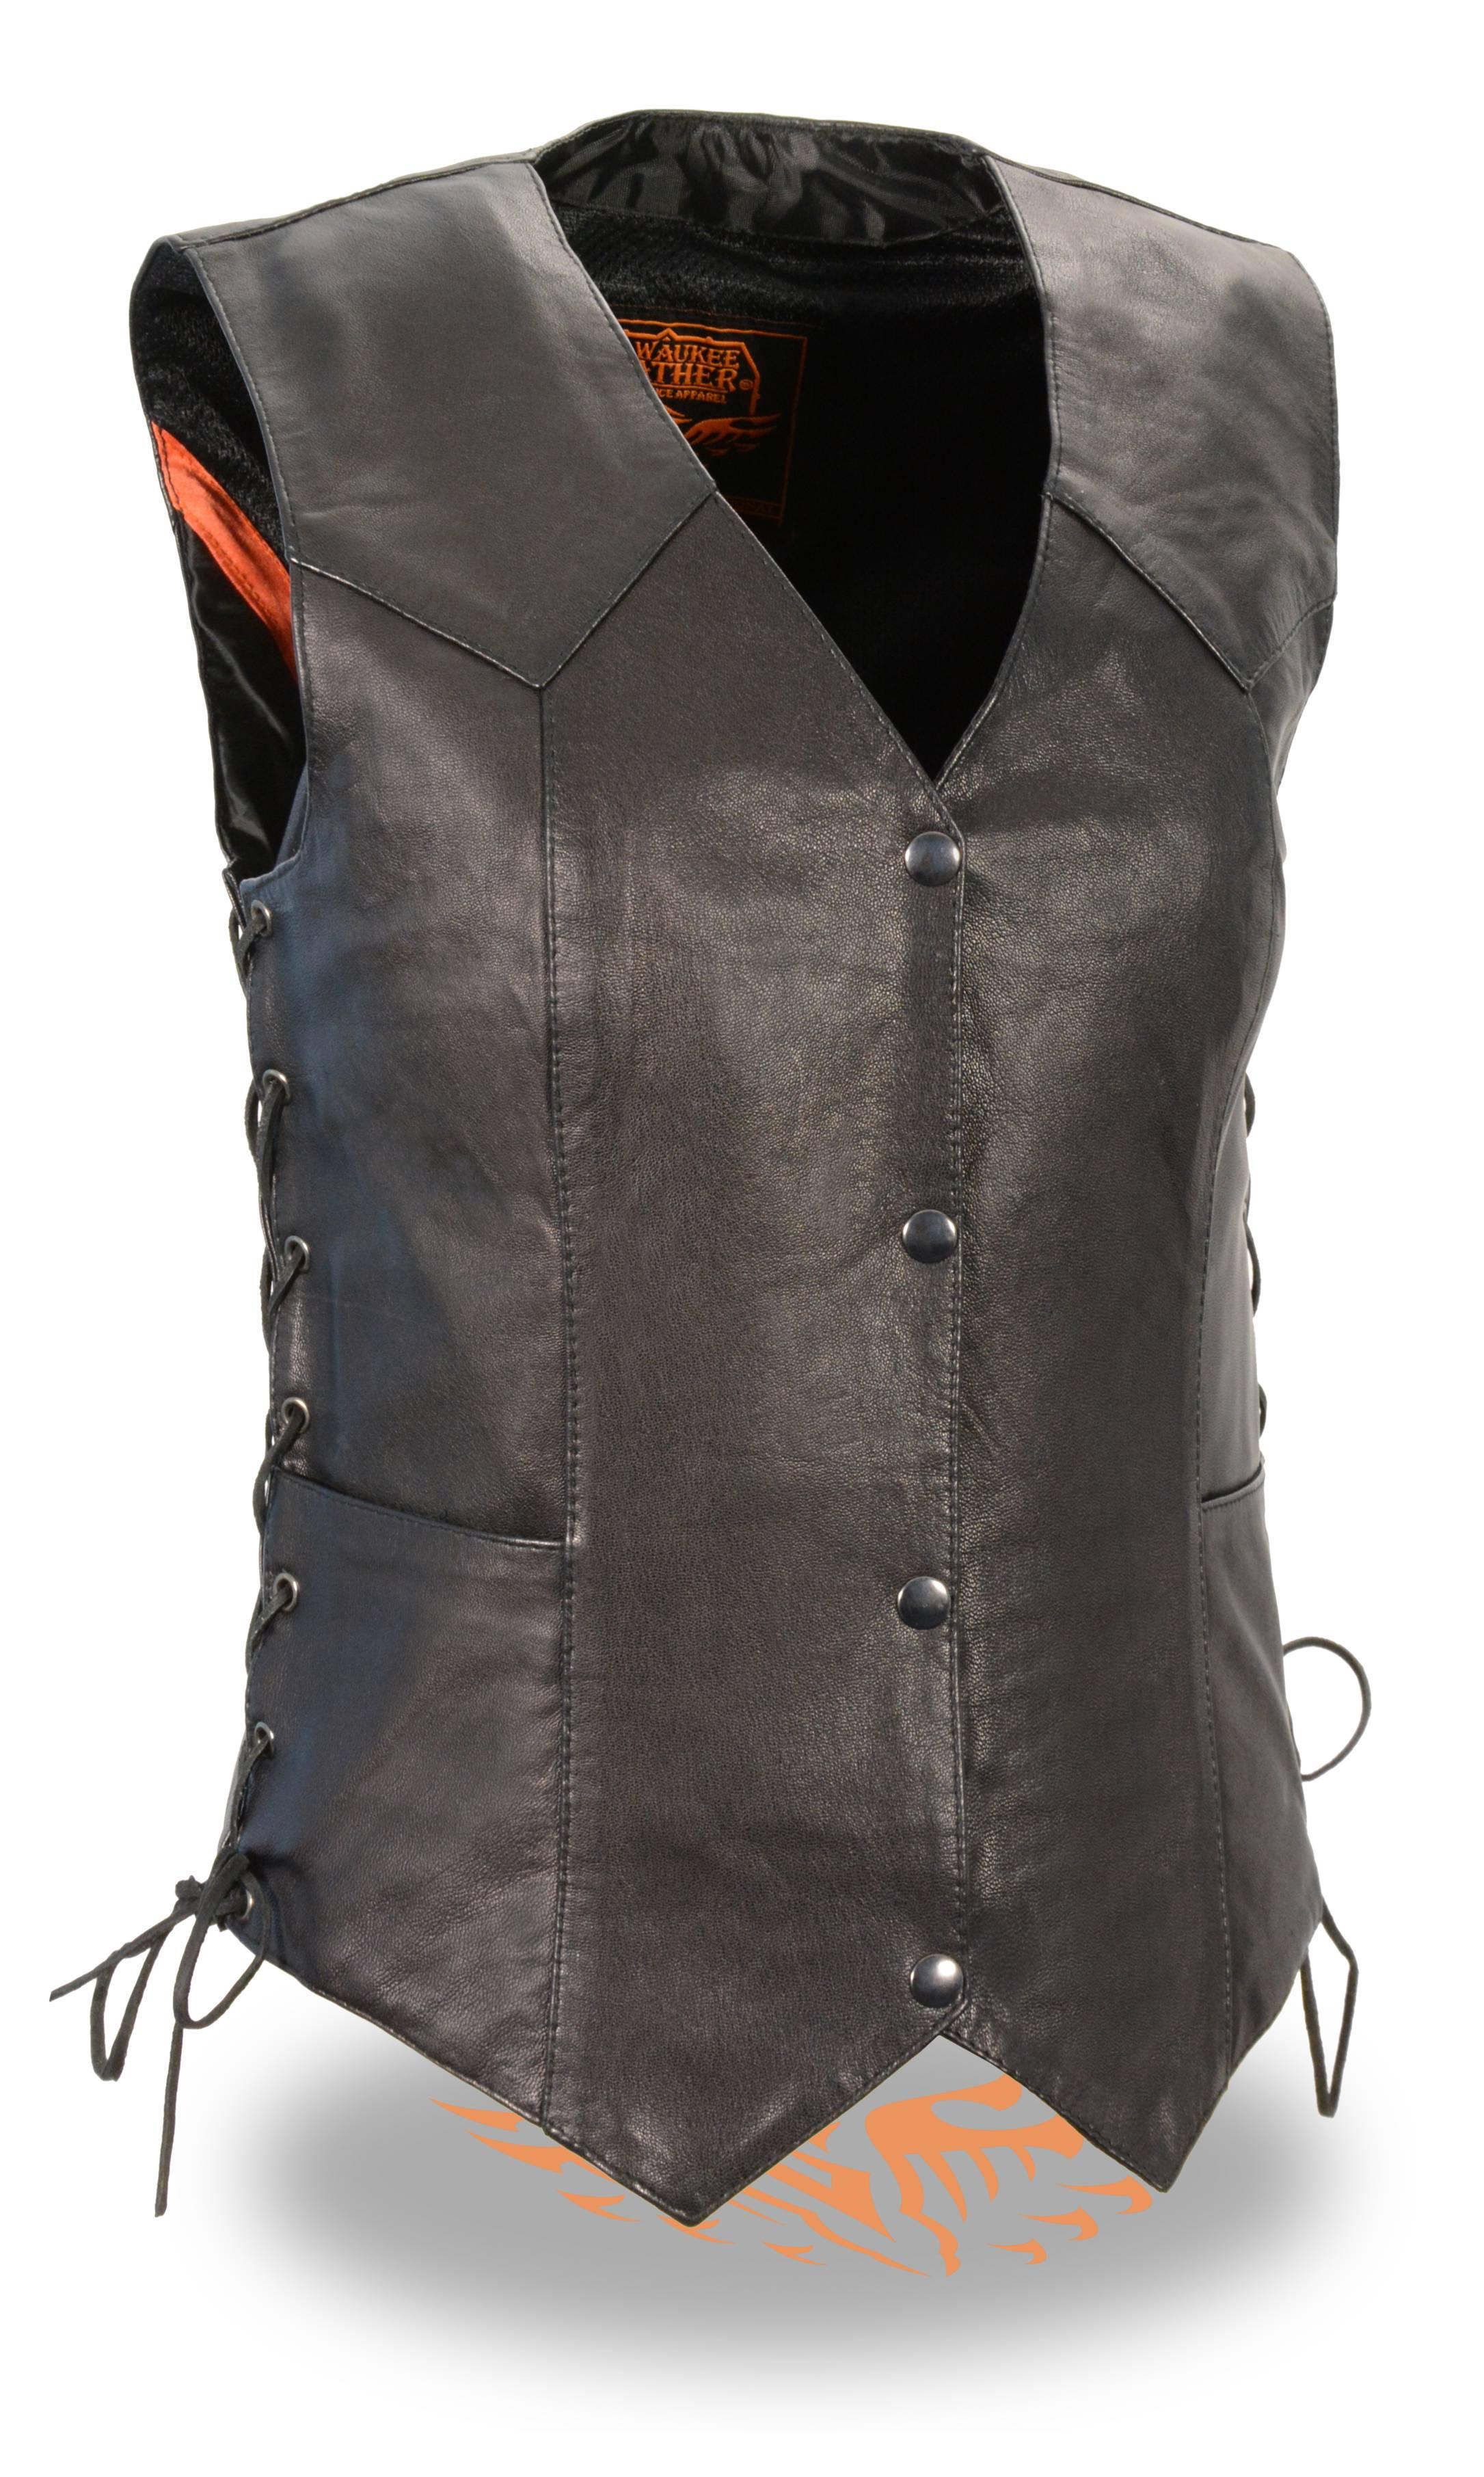 Ladies Black Naked Goatskin Leather Biker Vest, Light Weight